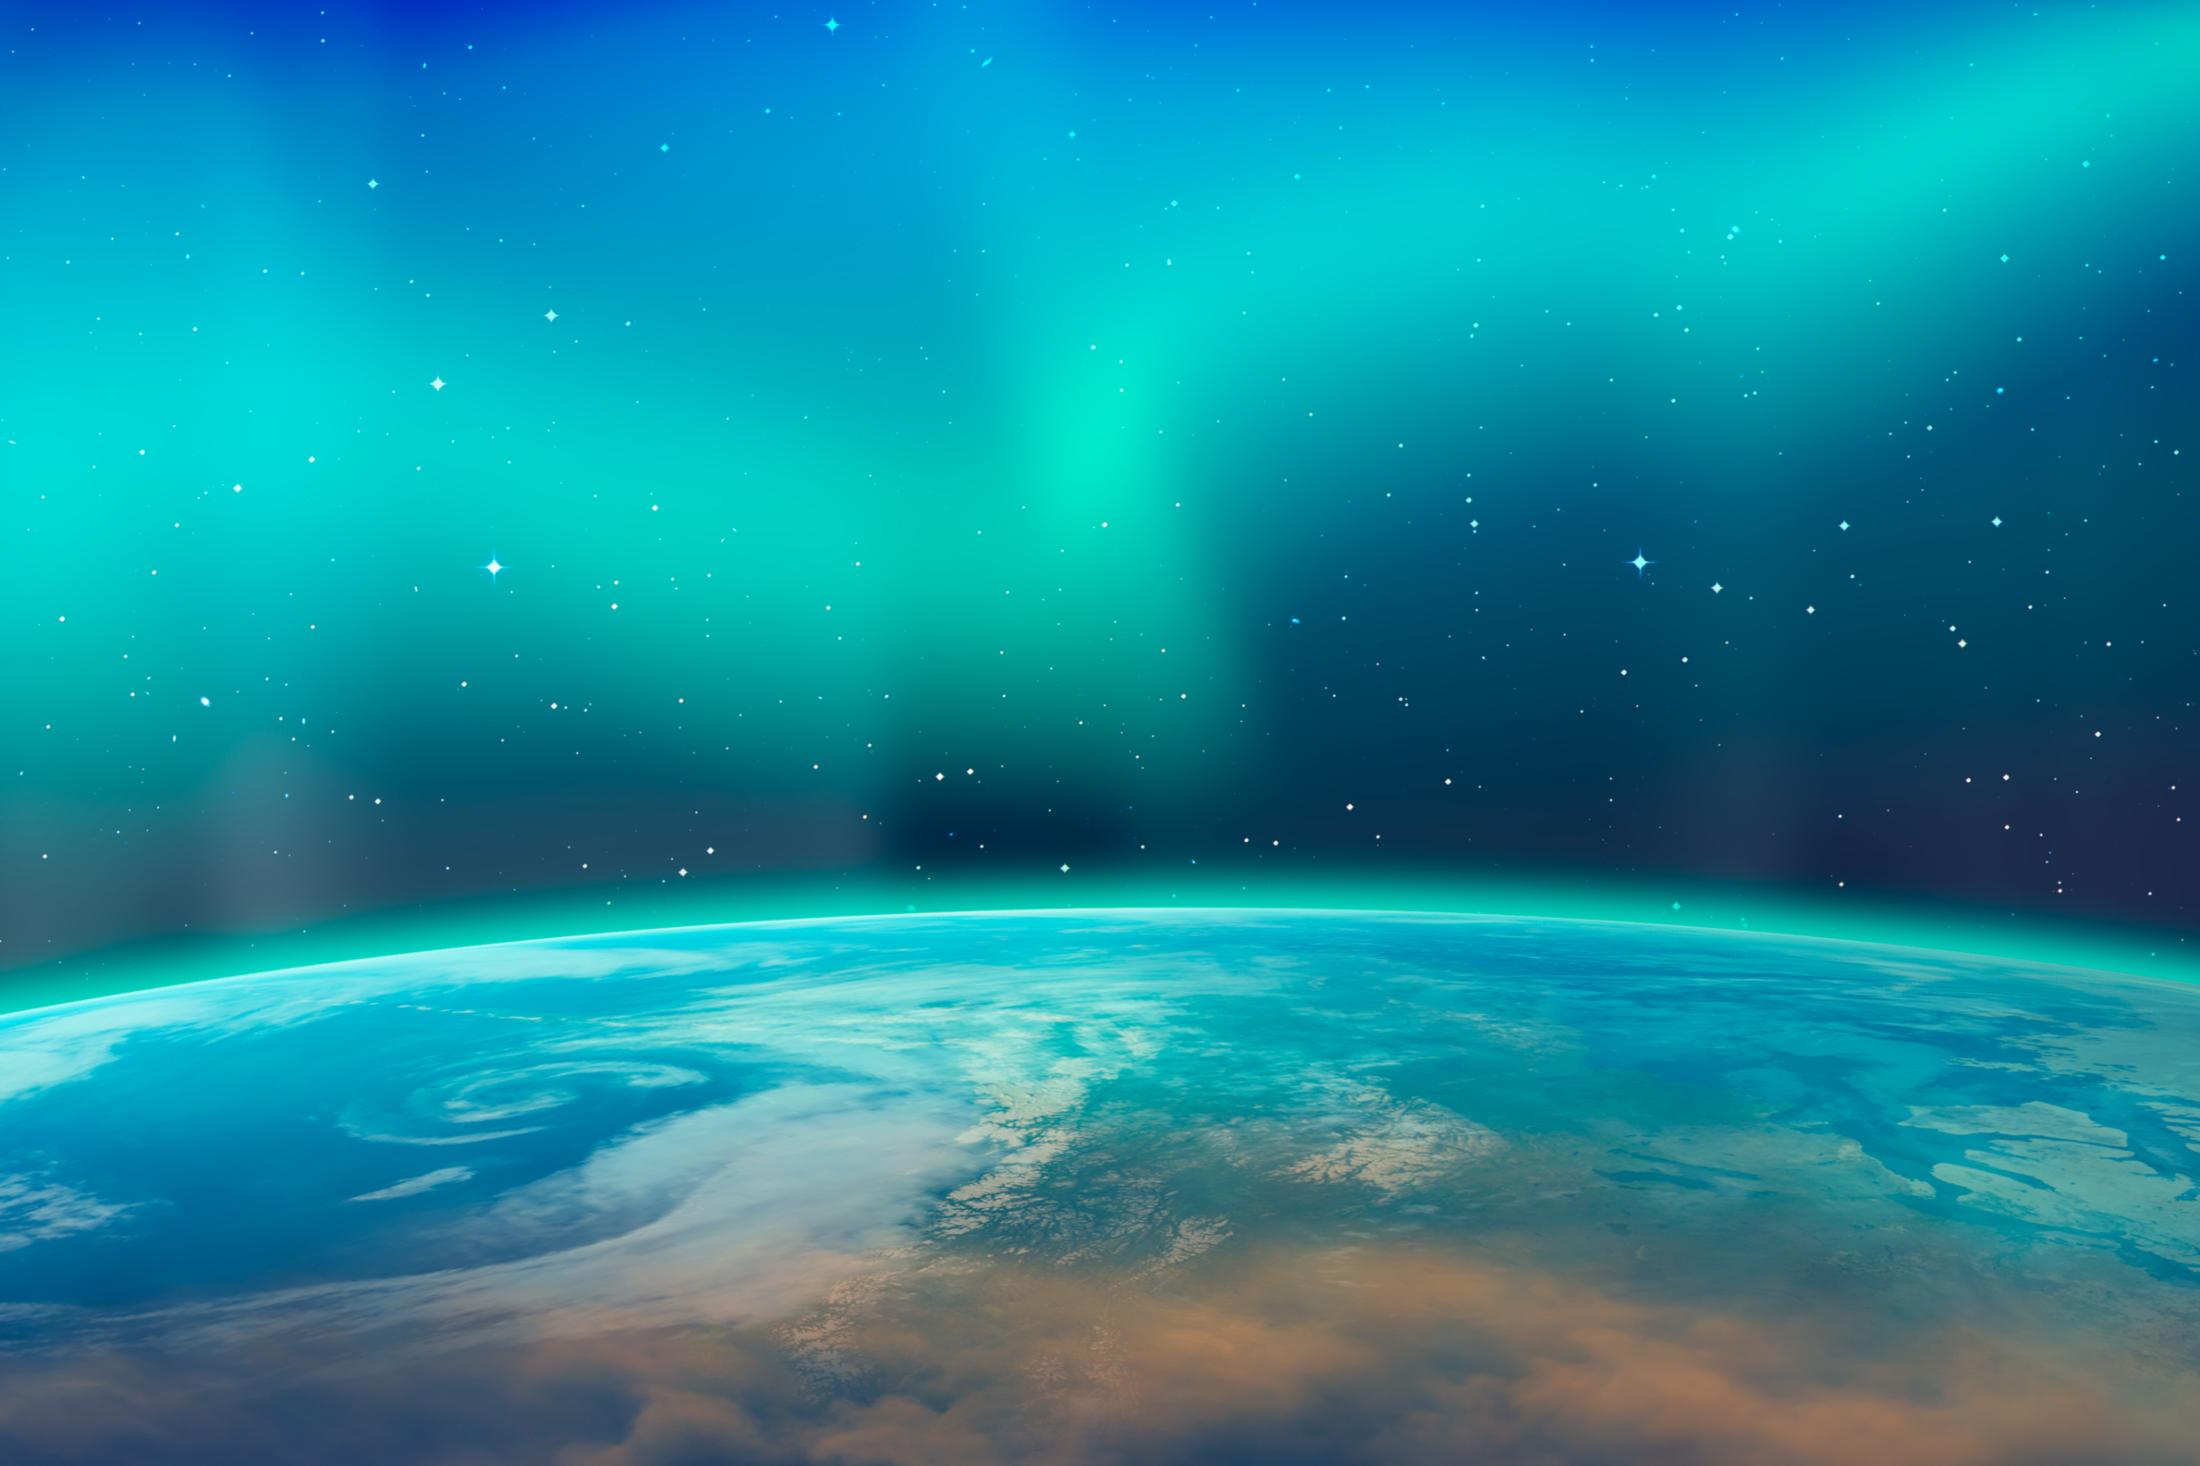 Aurora Borealis North Lights.  Image components provided by NASA.  Image_Mura T, Shutterstock